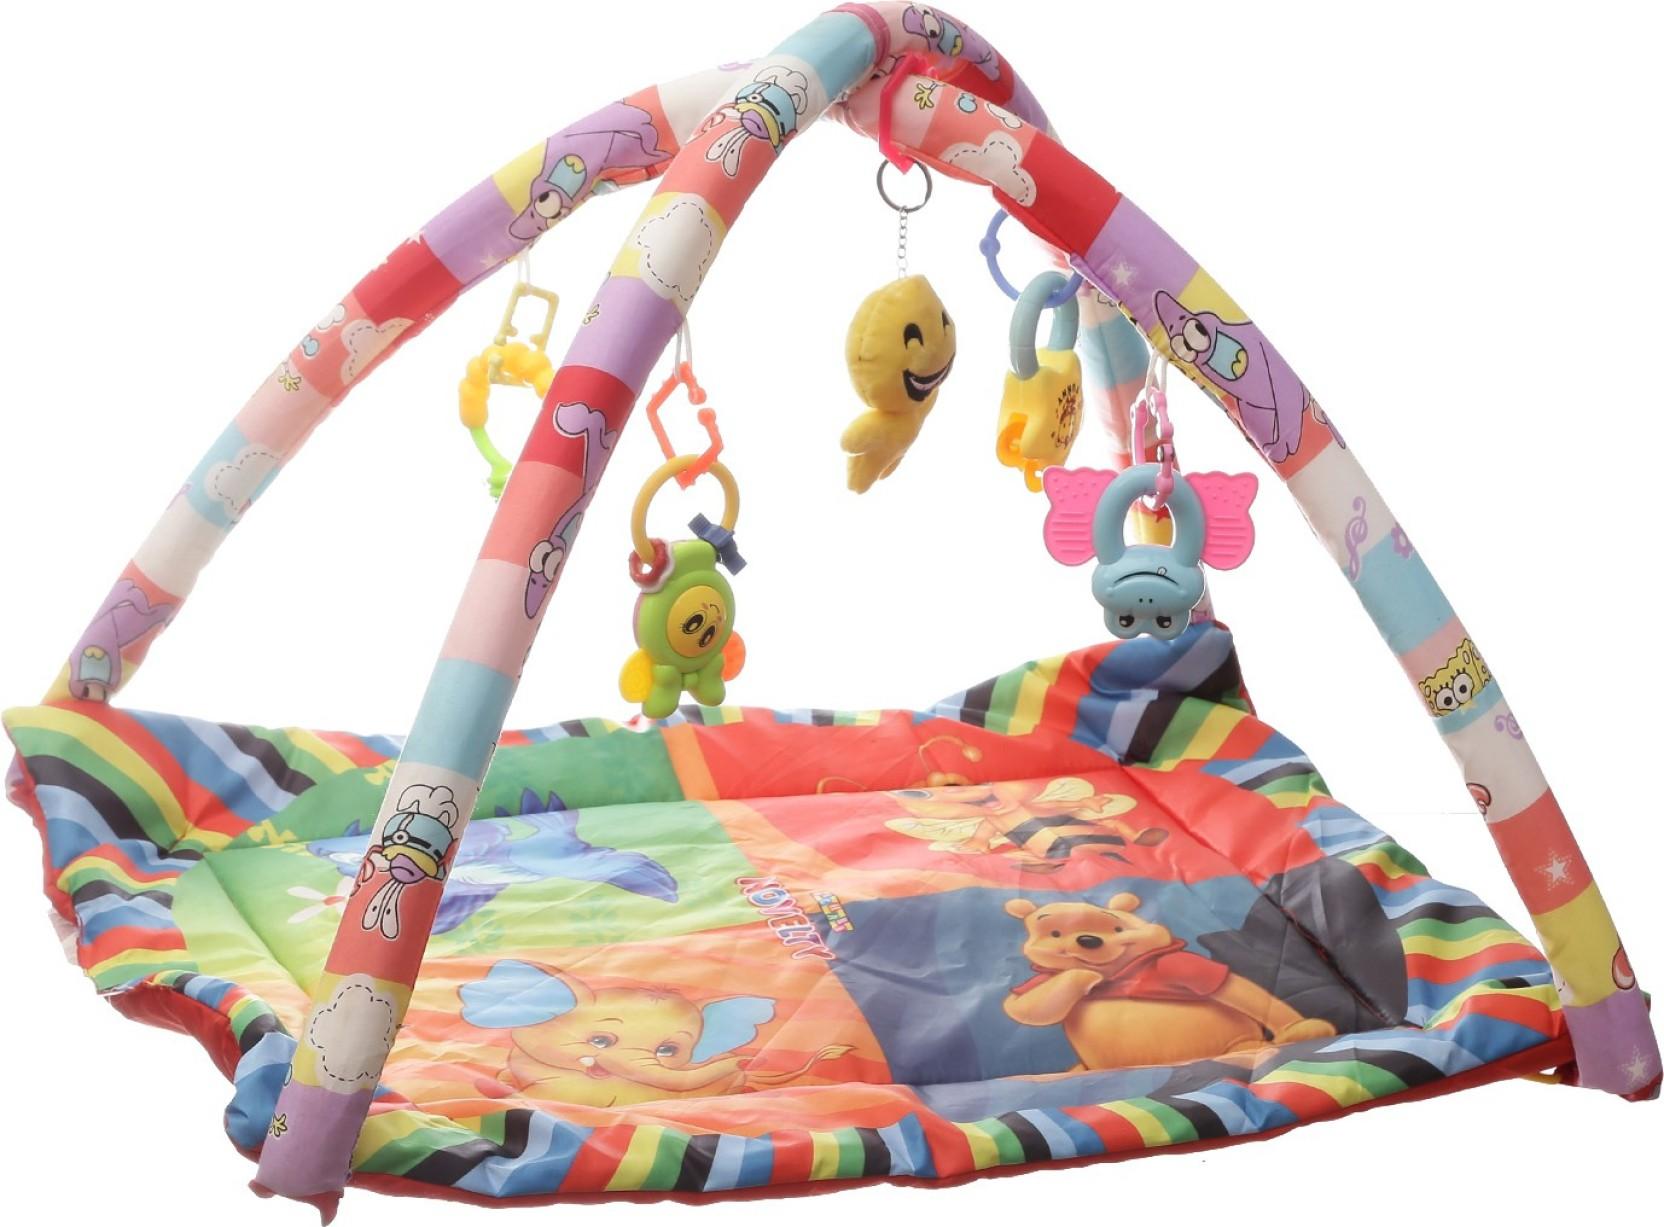 NHR NHR Baby Happy Play Gym NHR Baby Happy Play Gym Buy Baby